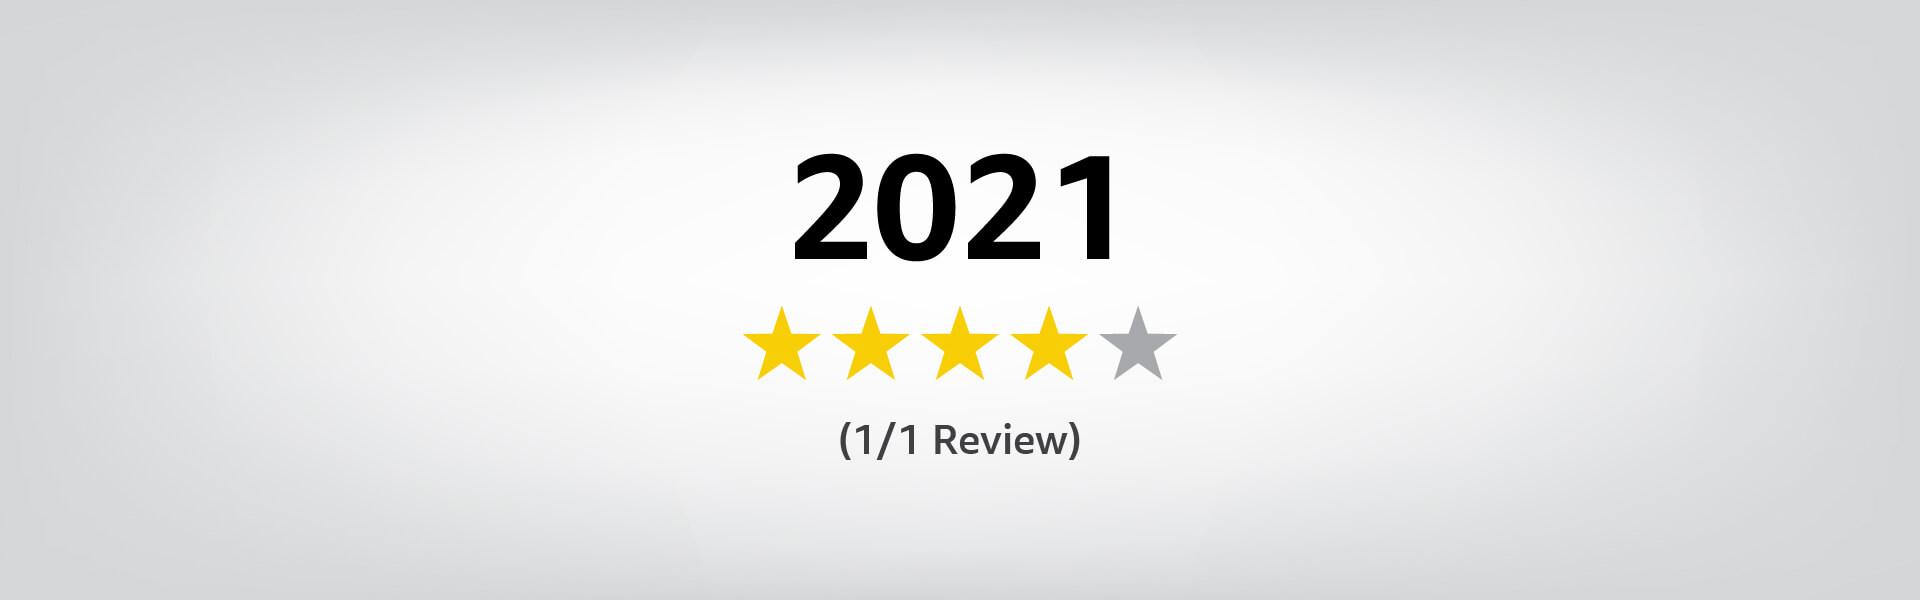 Ad agency reviews 2021